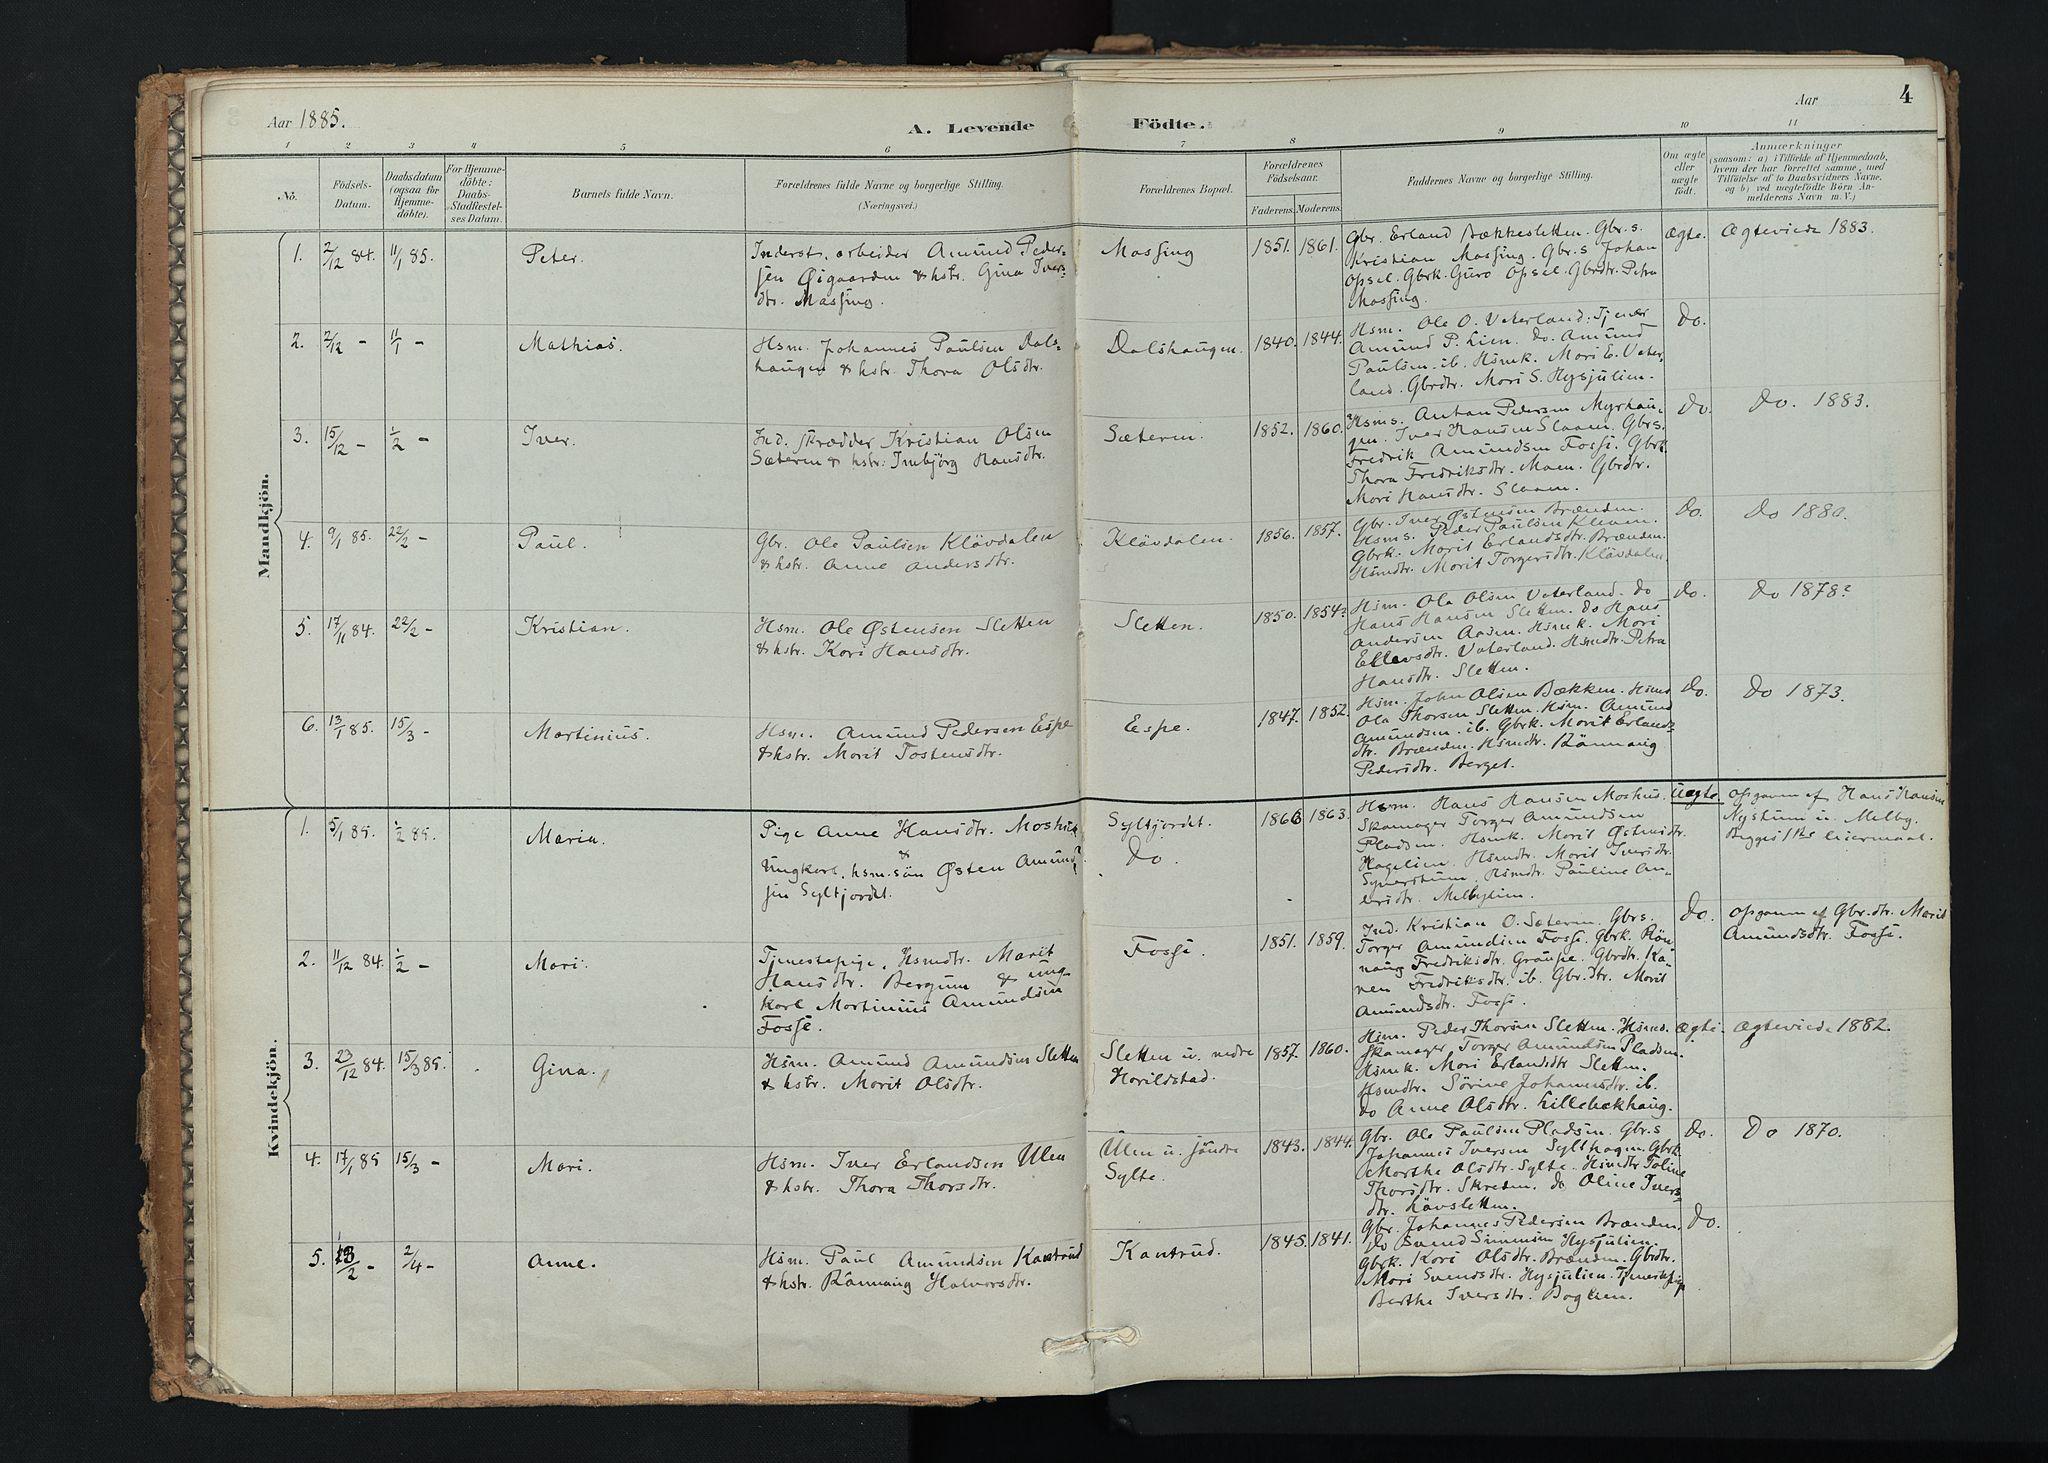 SAH, Nord-Fron prestekontor, Ministerialbok nr. 5, 1884-1914, s. 4